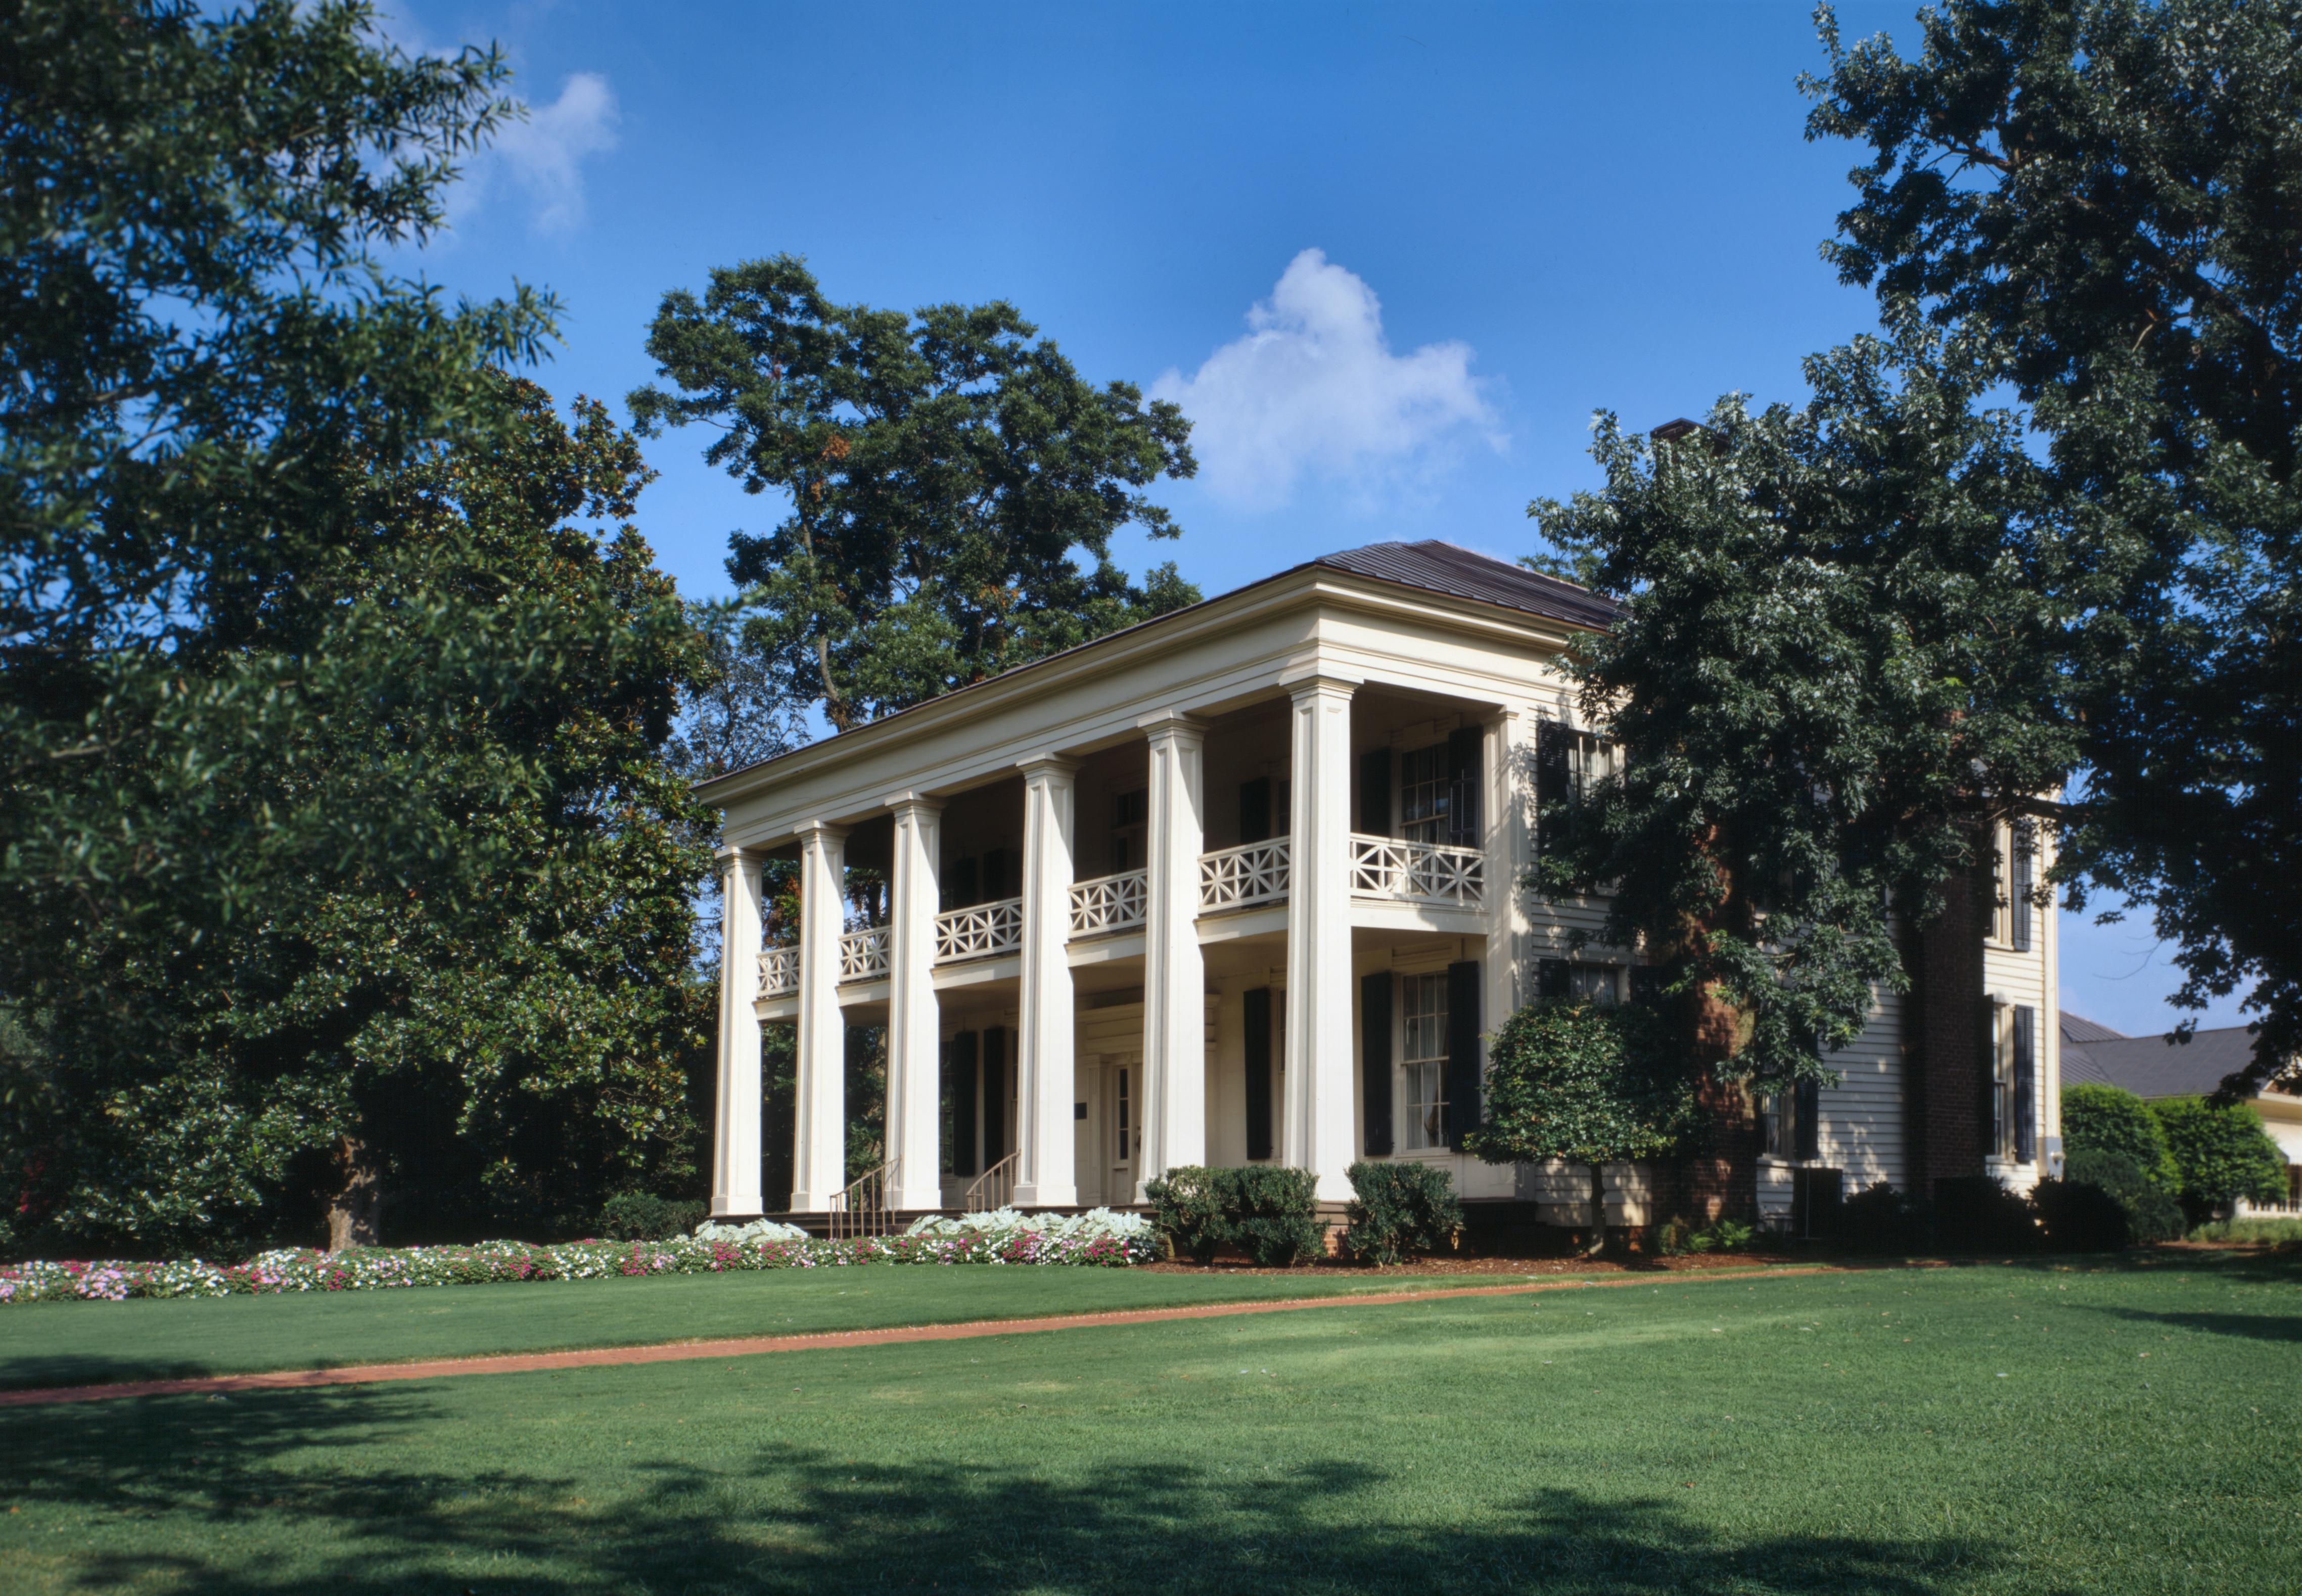 Arlington Antebellum Home & Gardens